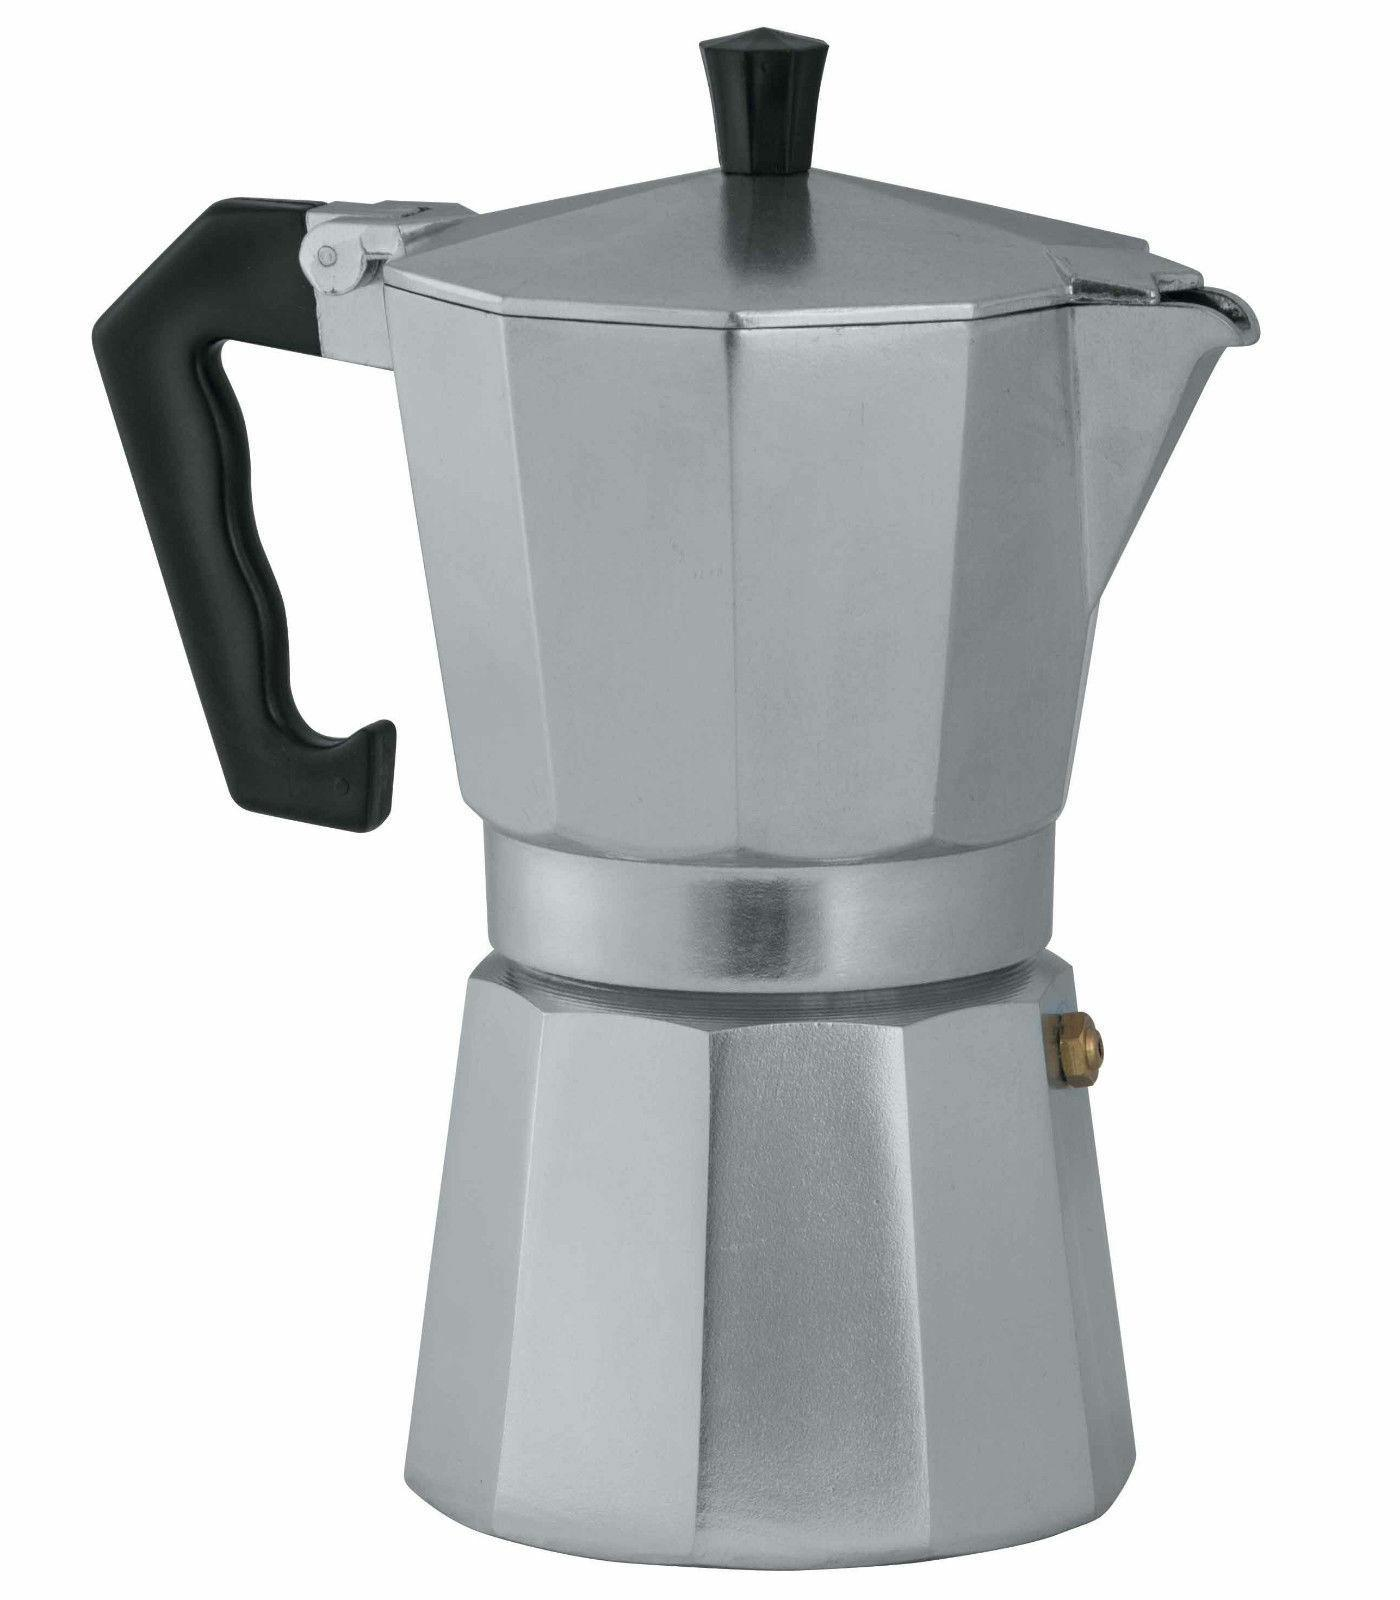 new classic pro aluminium espresso maker 9